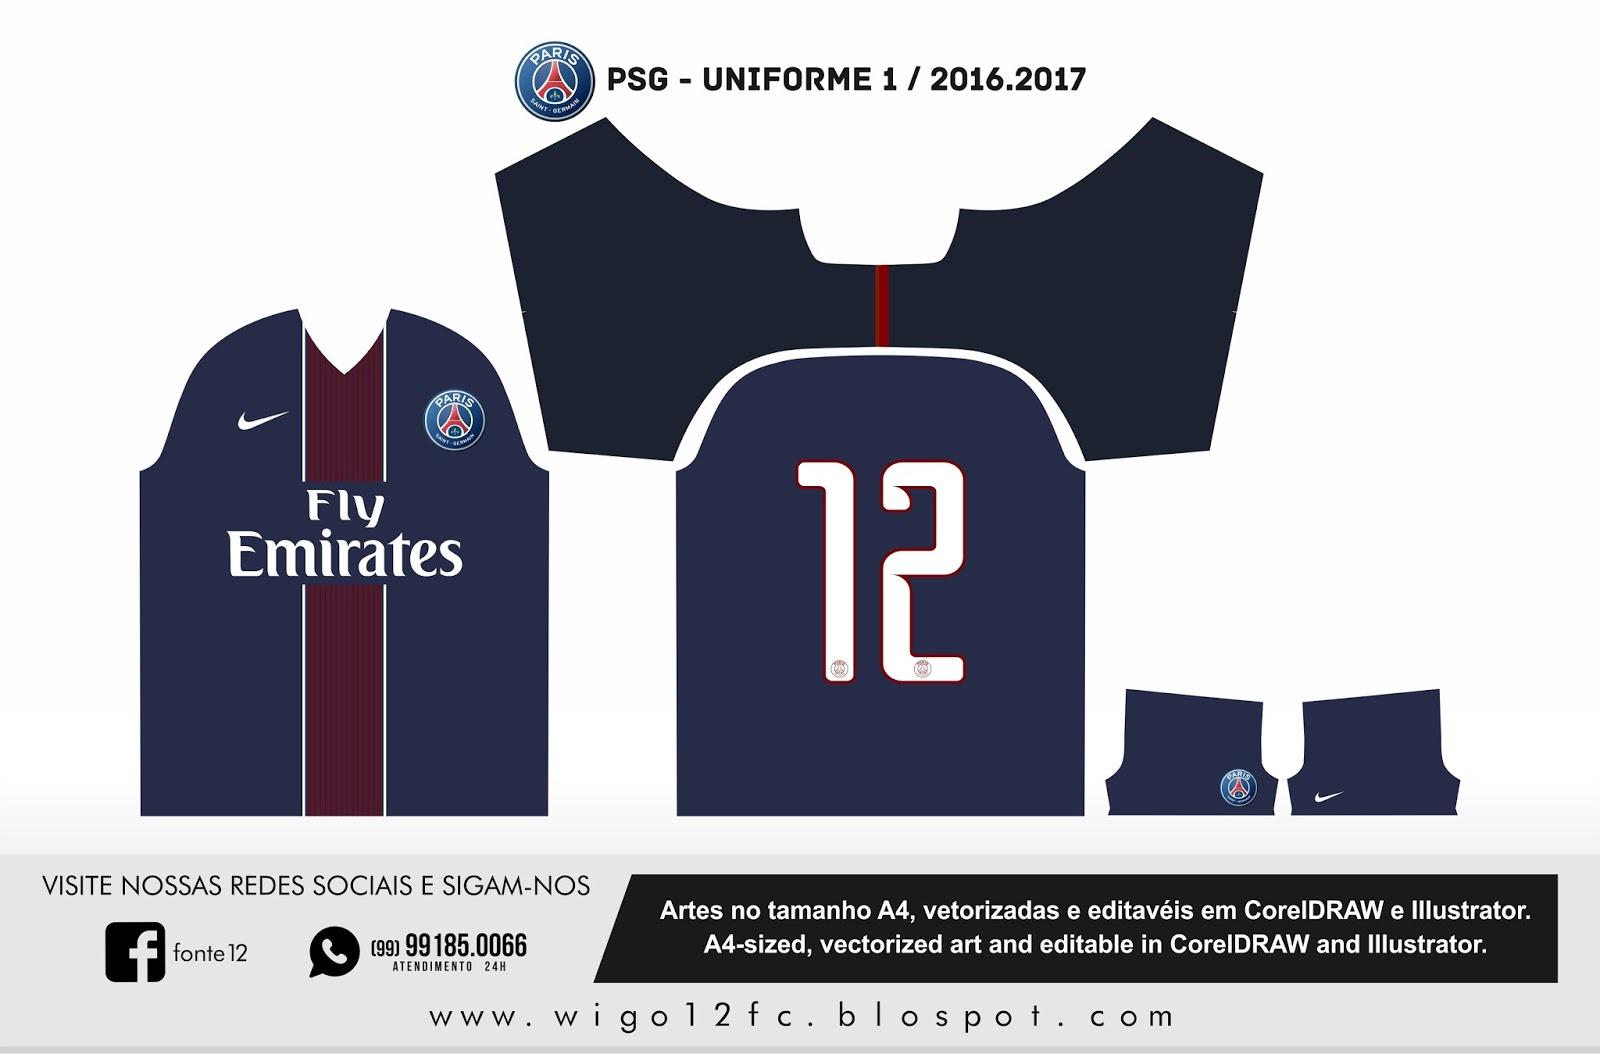 fontes camisas futebol uniforme psg 2016 2017. Black Bedroom Furniture Sets. Home Design Ideas